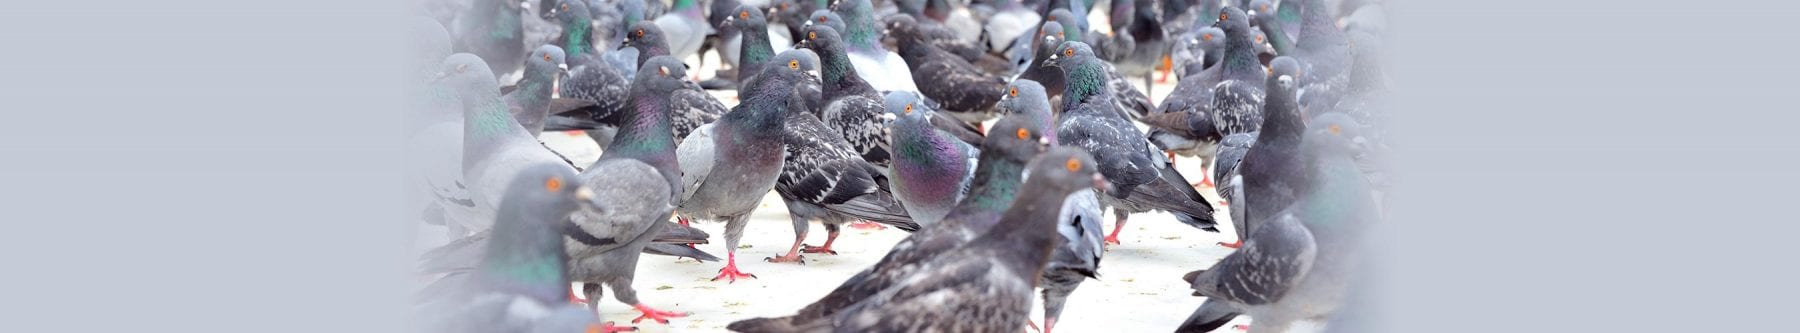 bird control vancouver bc